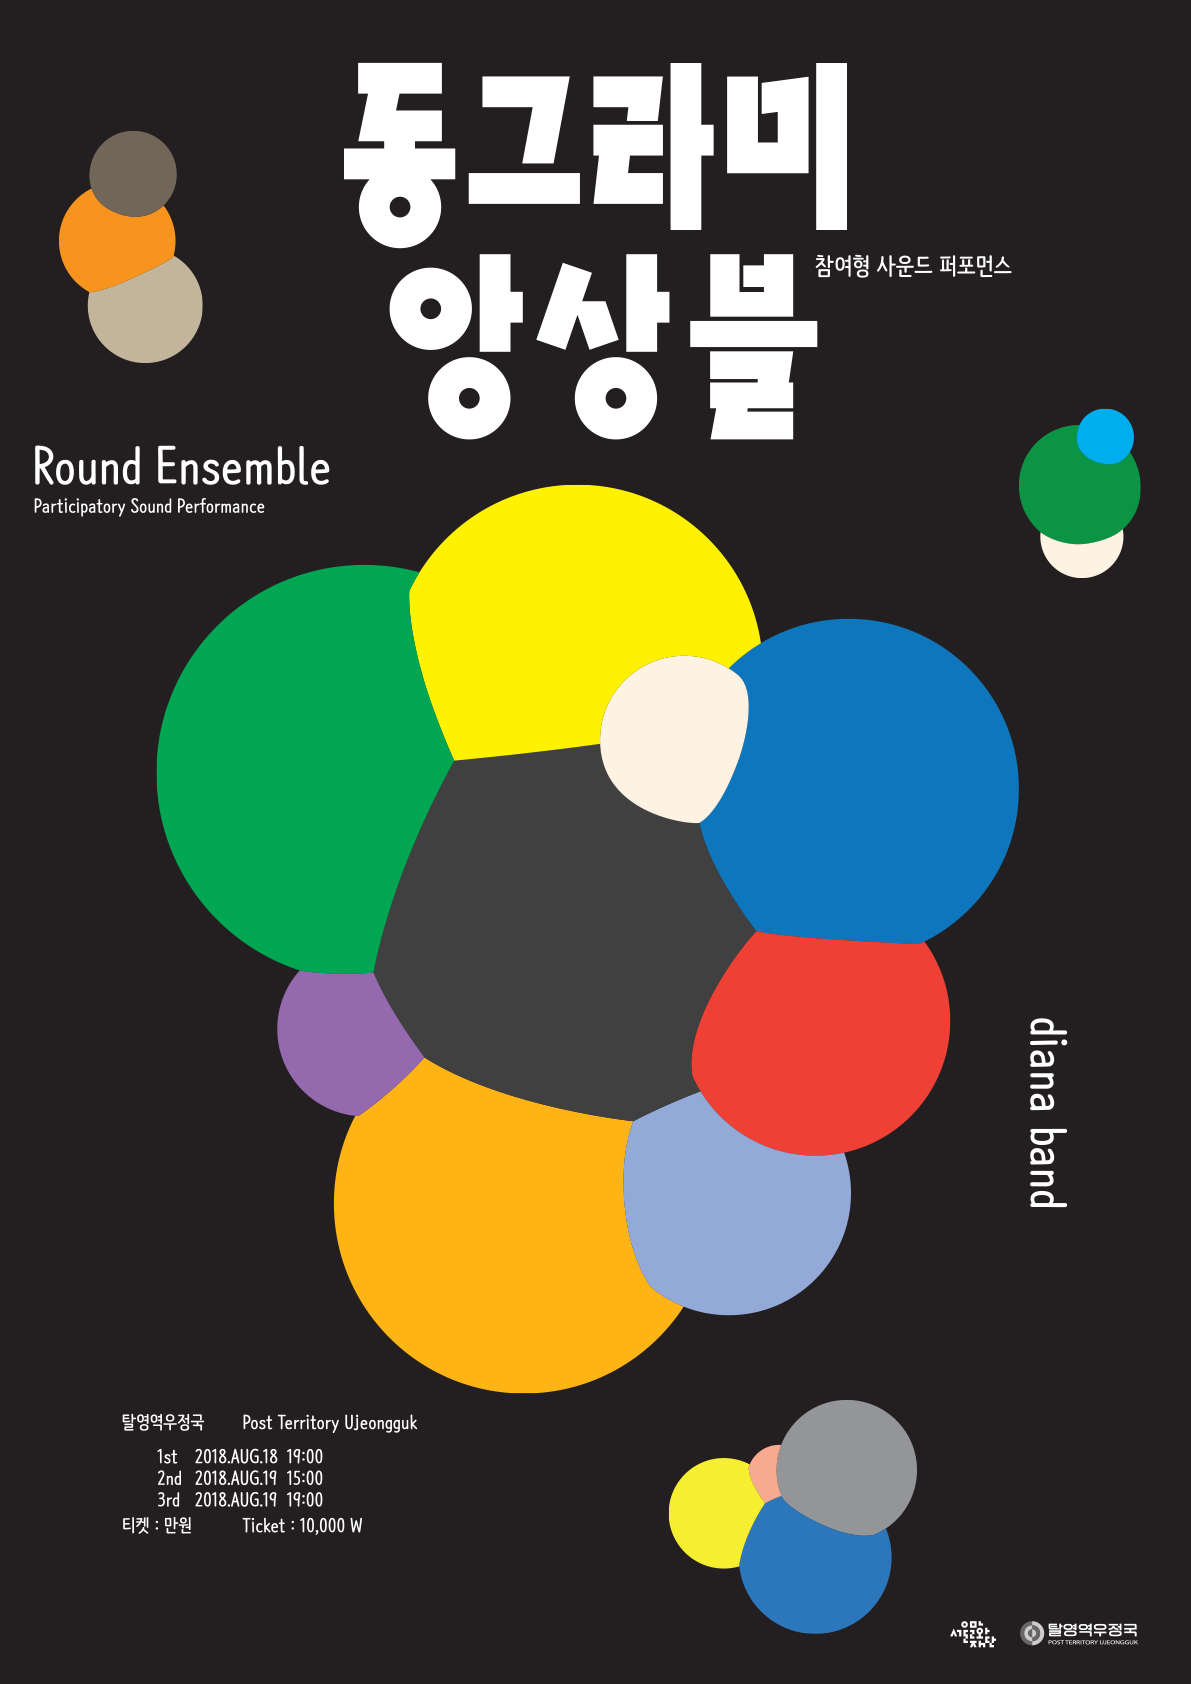 Round_Enemble_poster_01